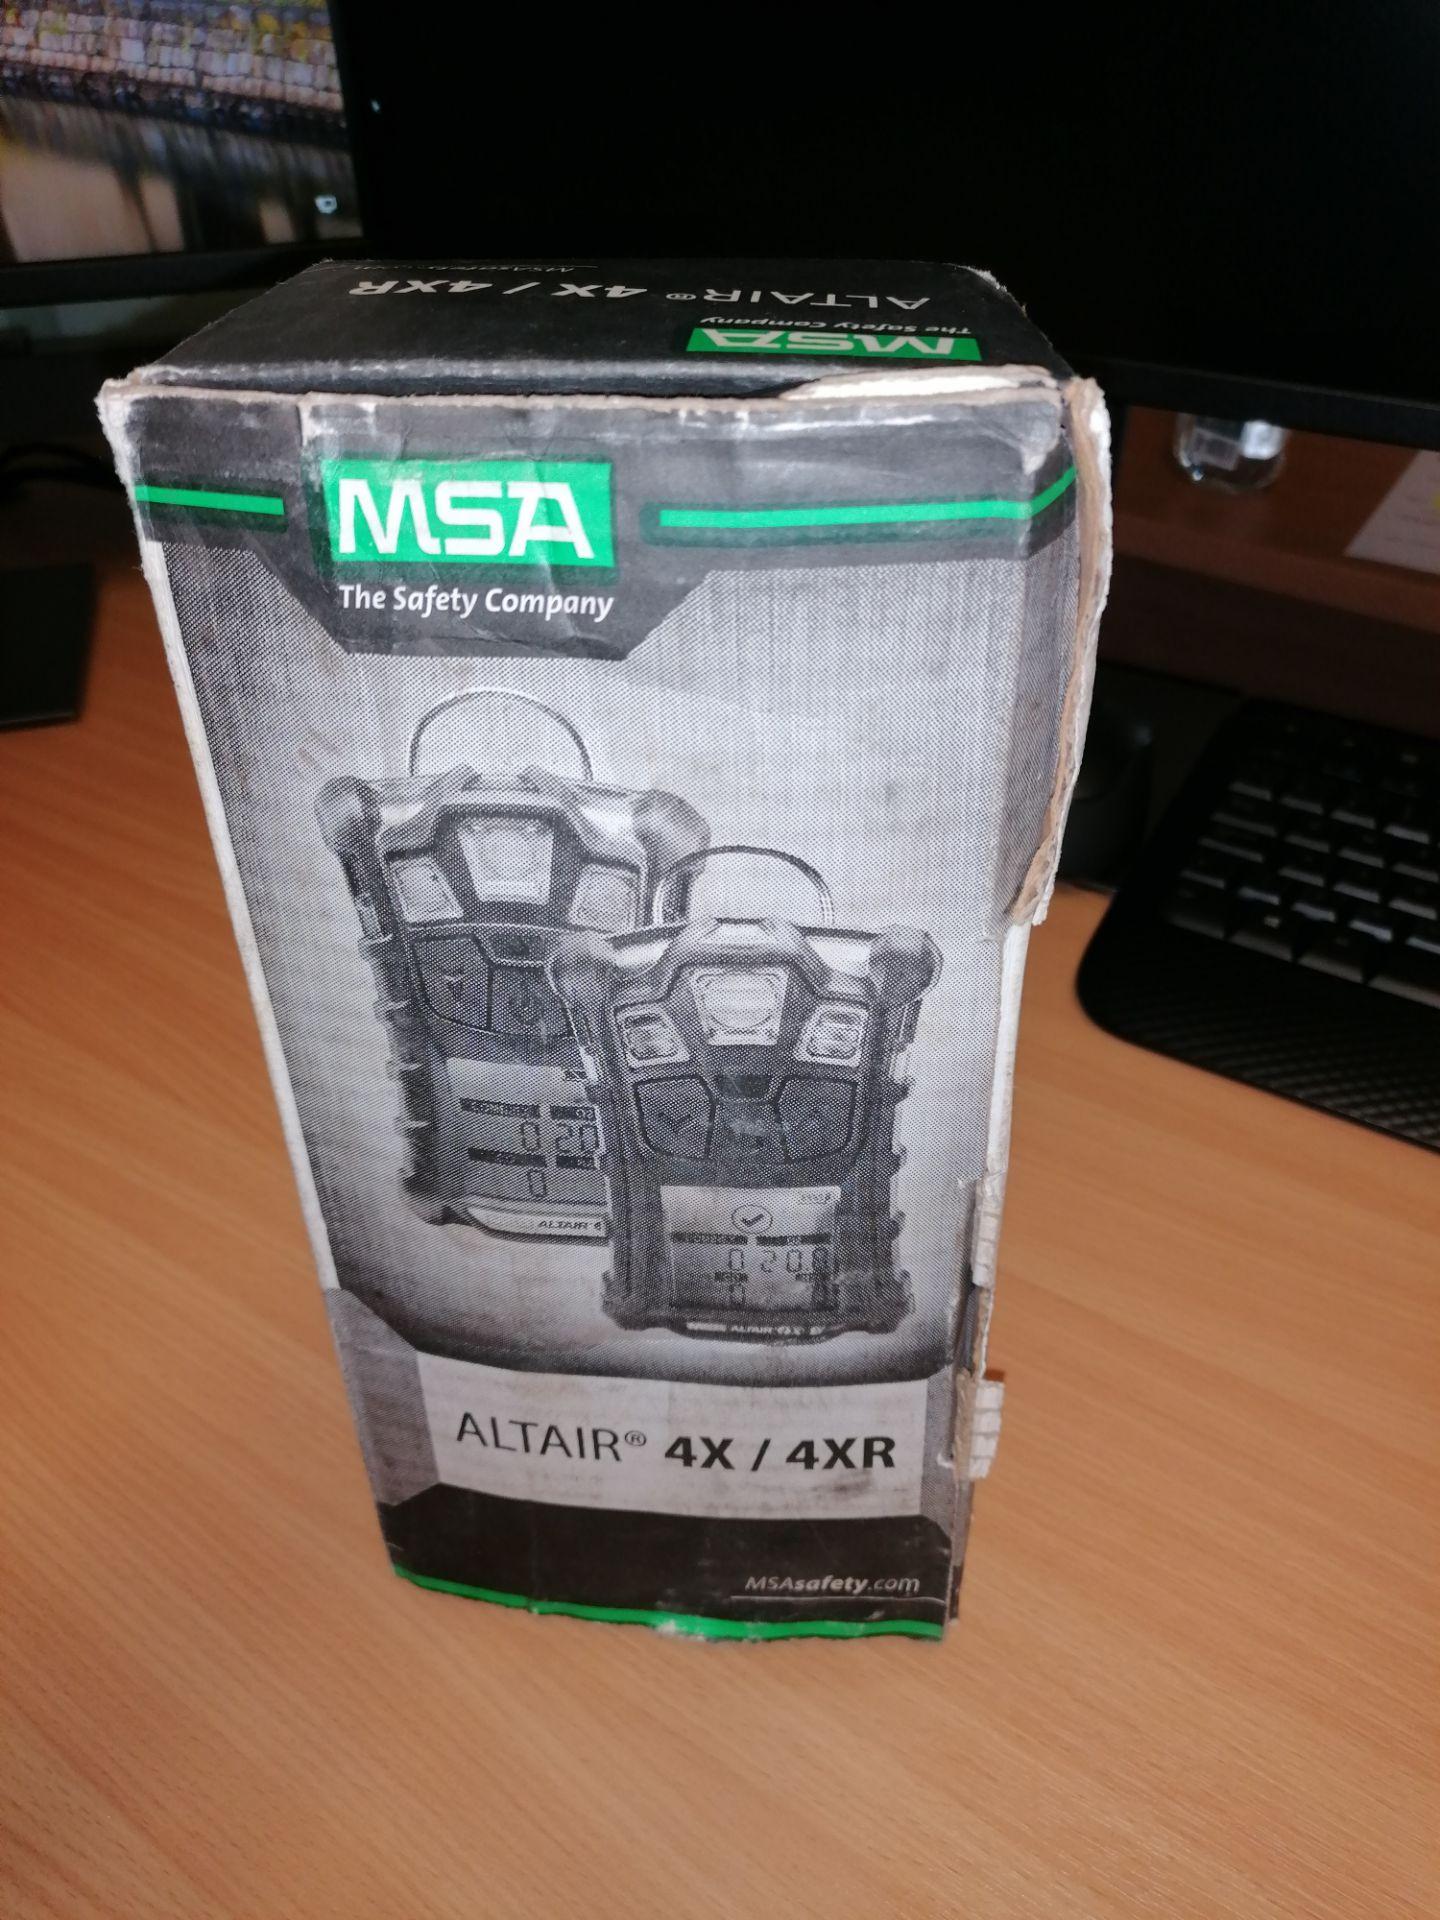 MSA Altair 4 Multi Gas Detector - Image 6 of 6